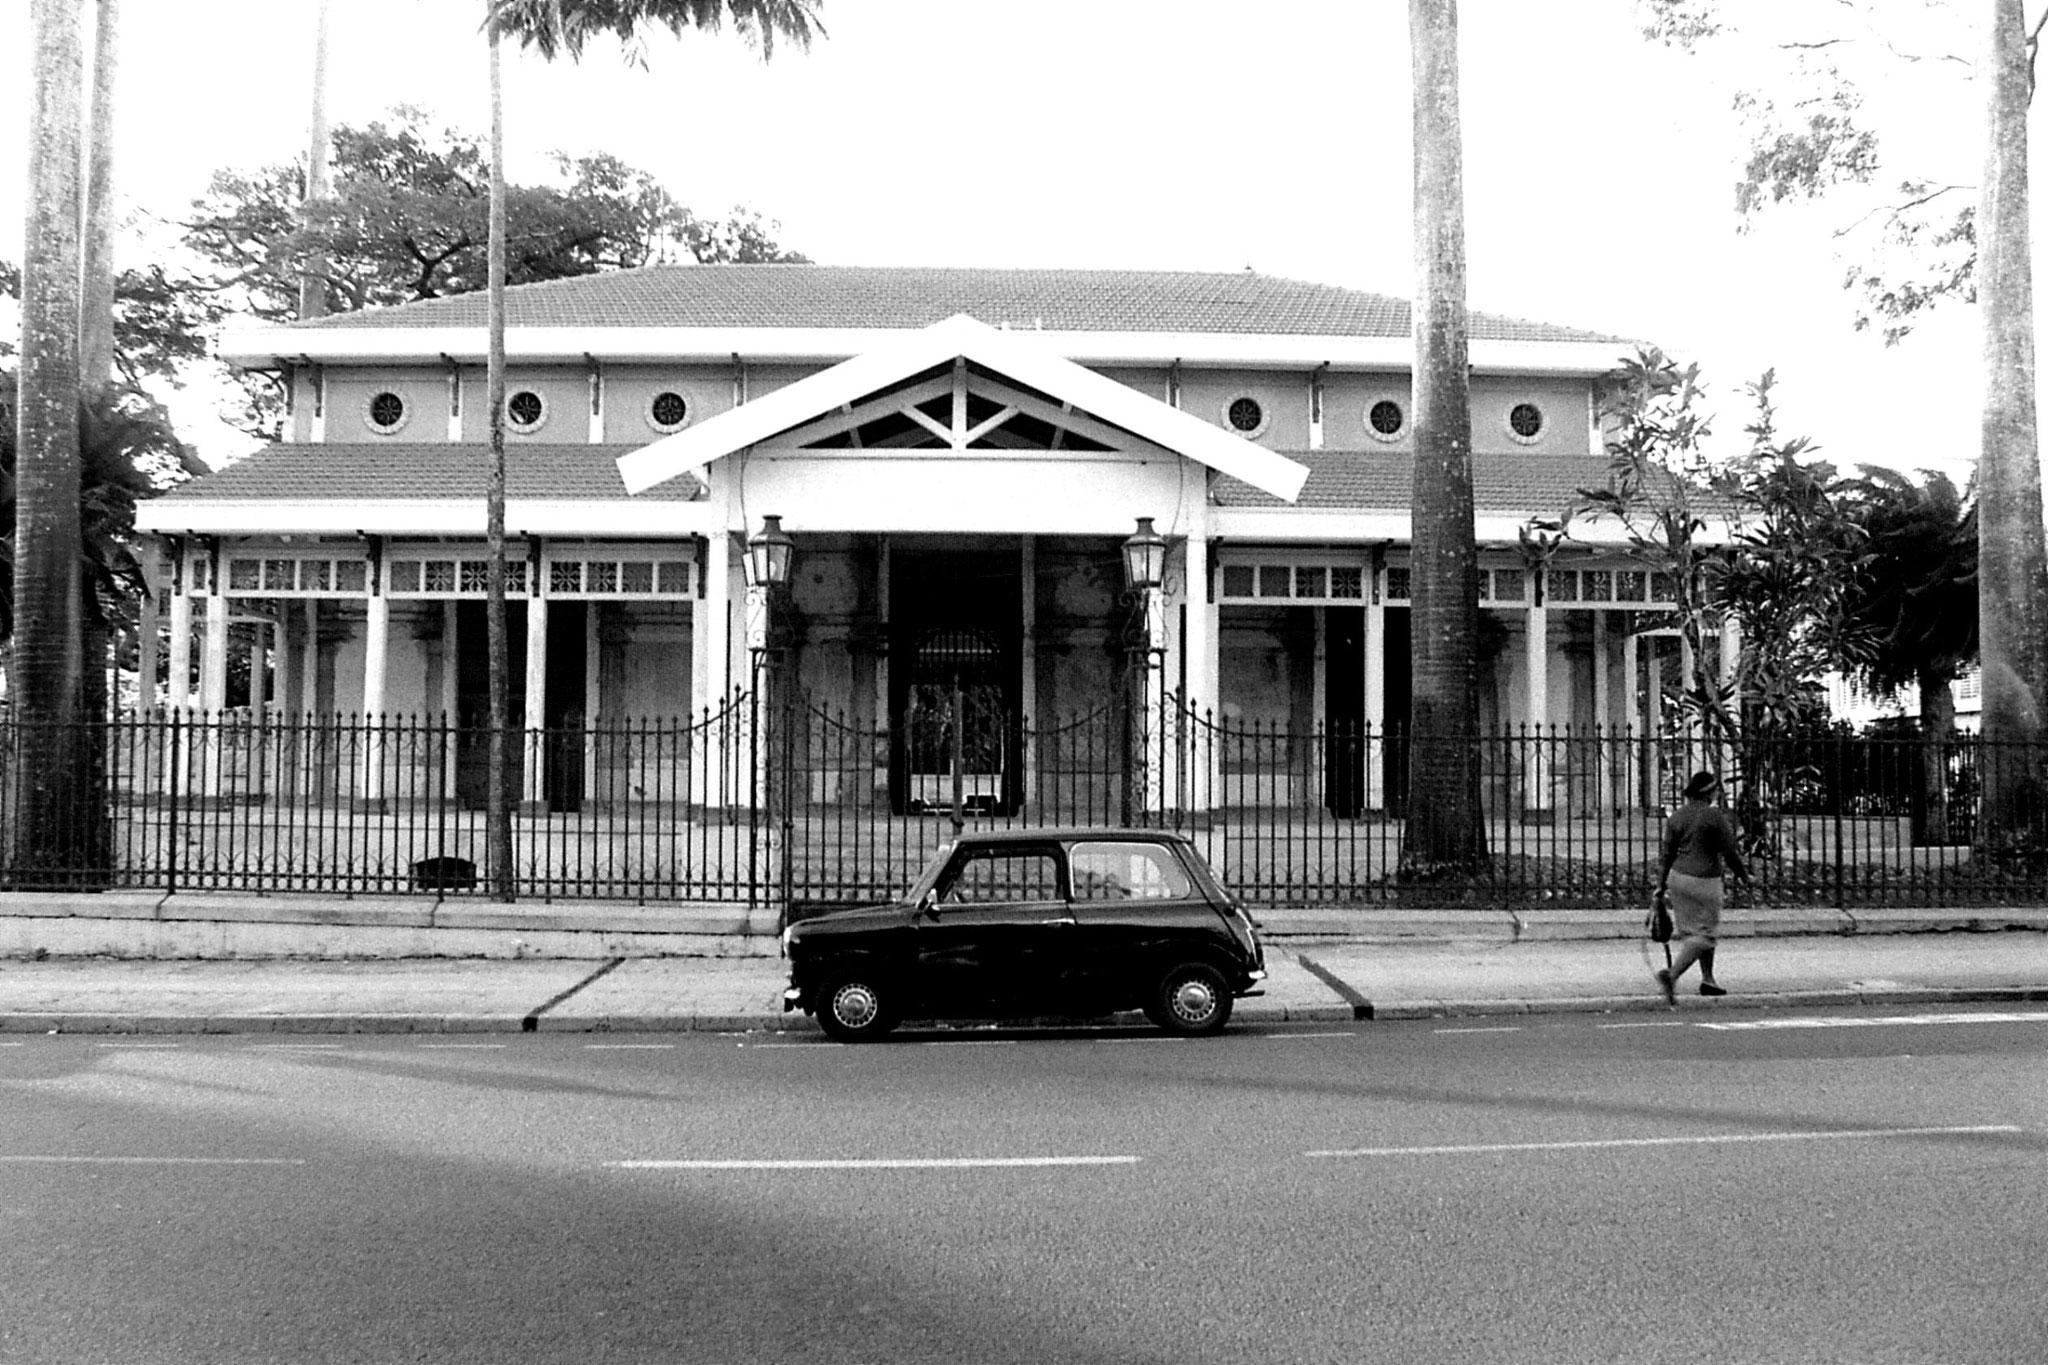 1/8/1990: 21: Noumea New Caledonia